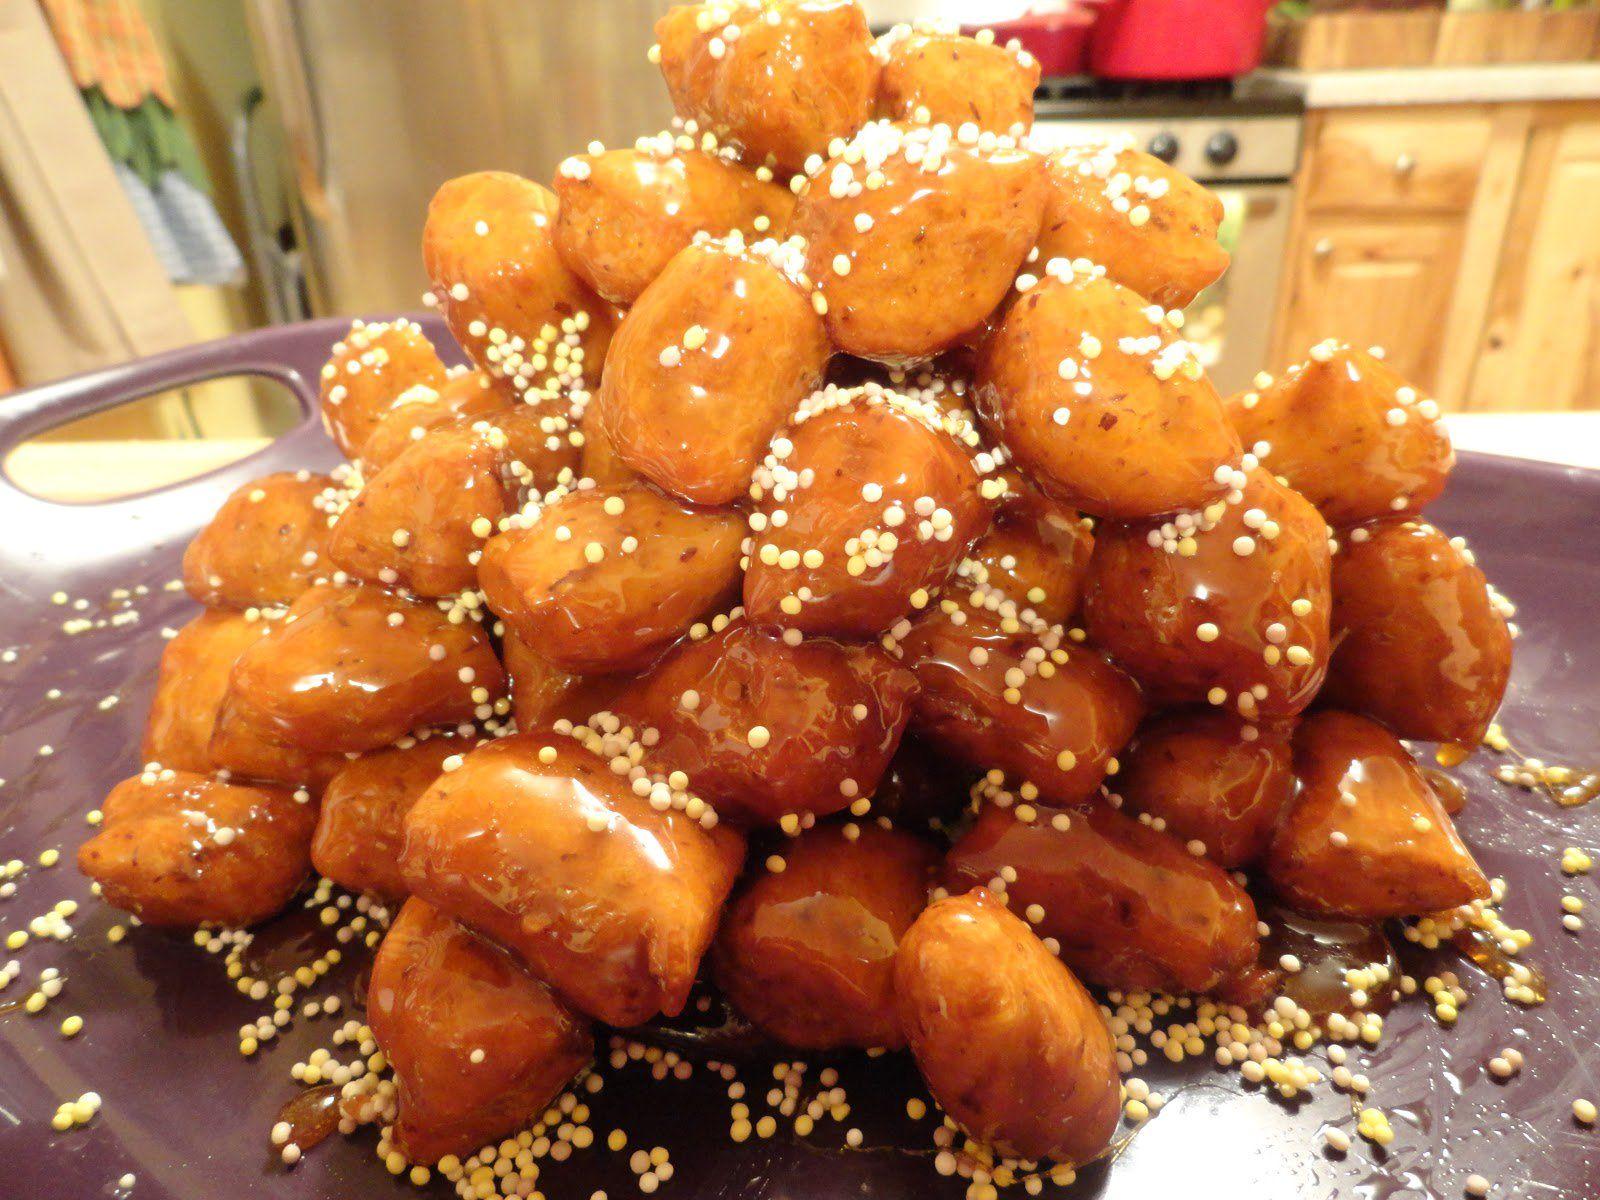 Vegan Gluten Free Jewish Bimuelos Fried Honey Puffs Regular And Gluten Free Hanukkah Food Jewish Recipes Recipes